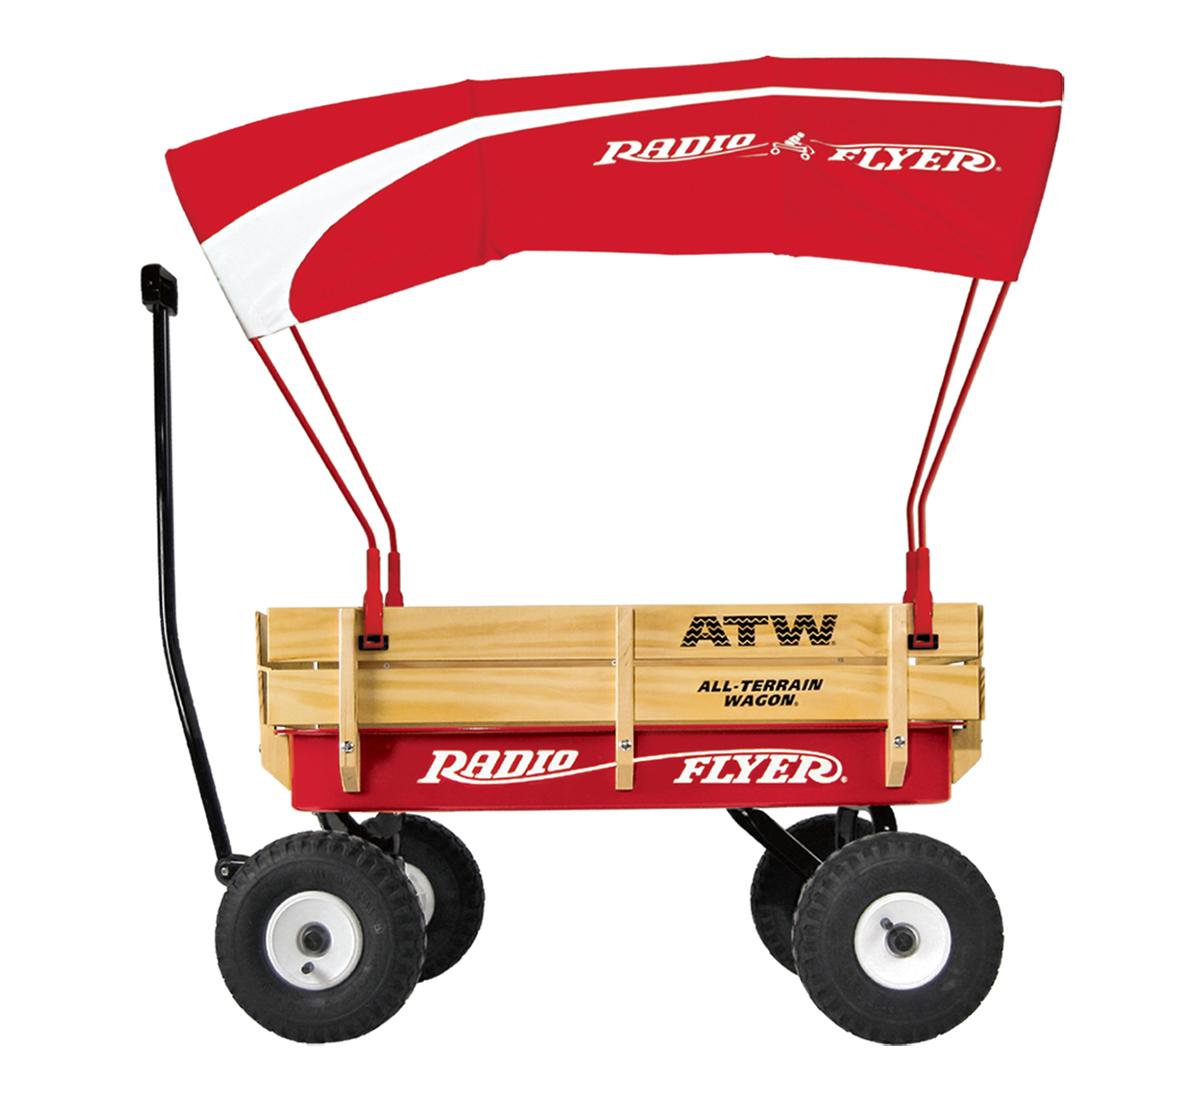 Fits all Wood Radio Flyer wagons